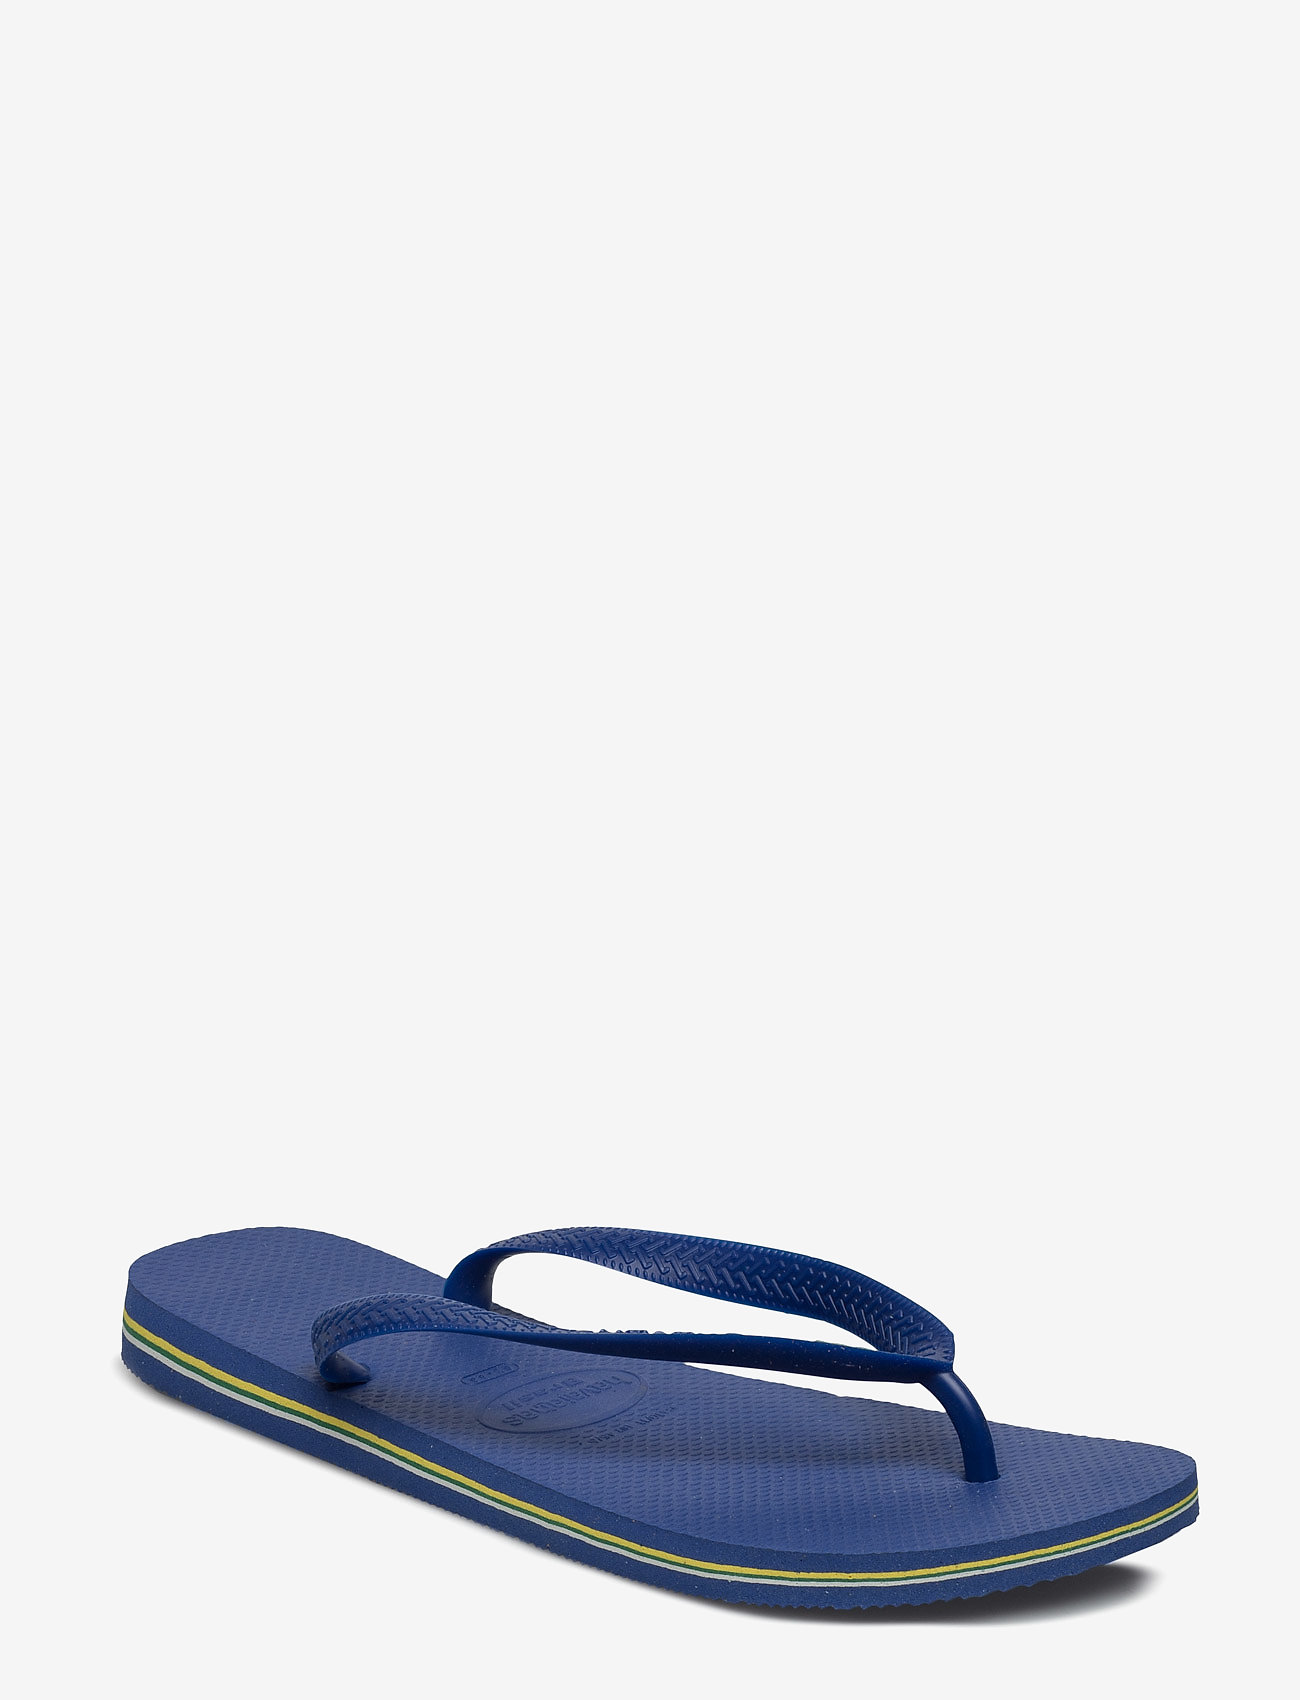 Havaianas - Brasil - teen slippers - 2711 marine blue - 0